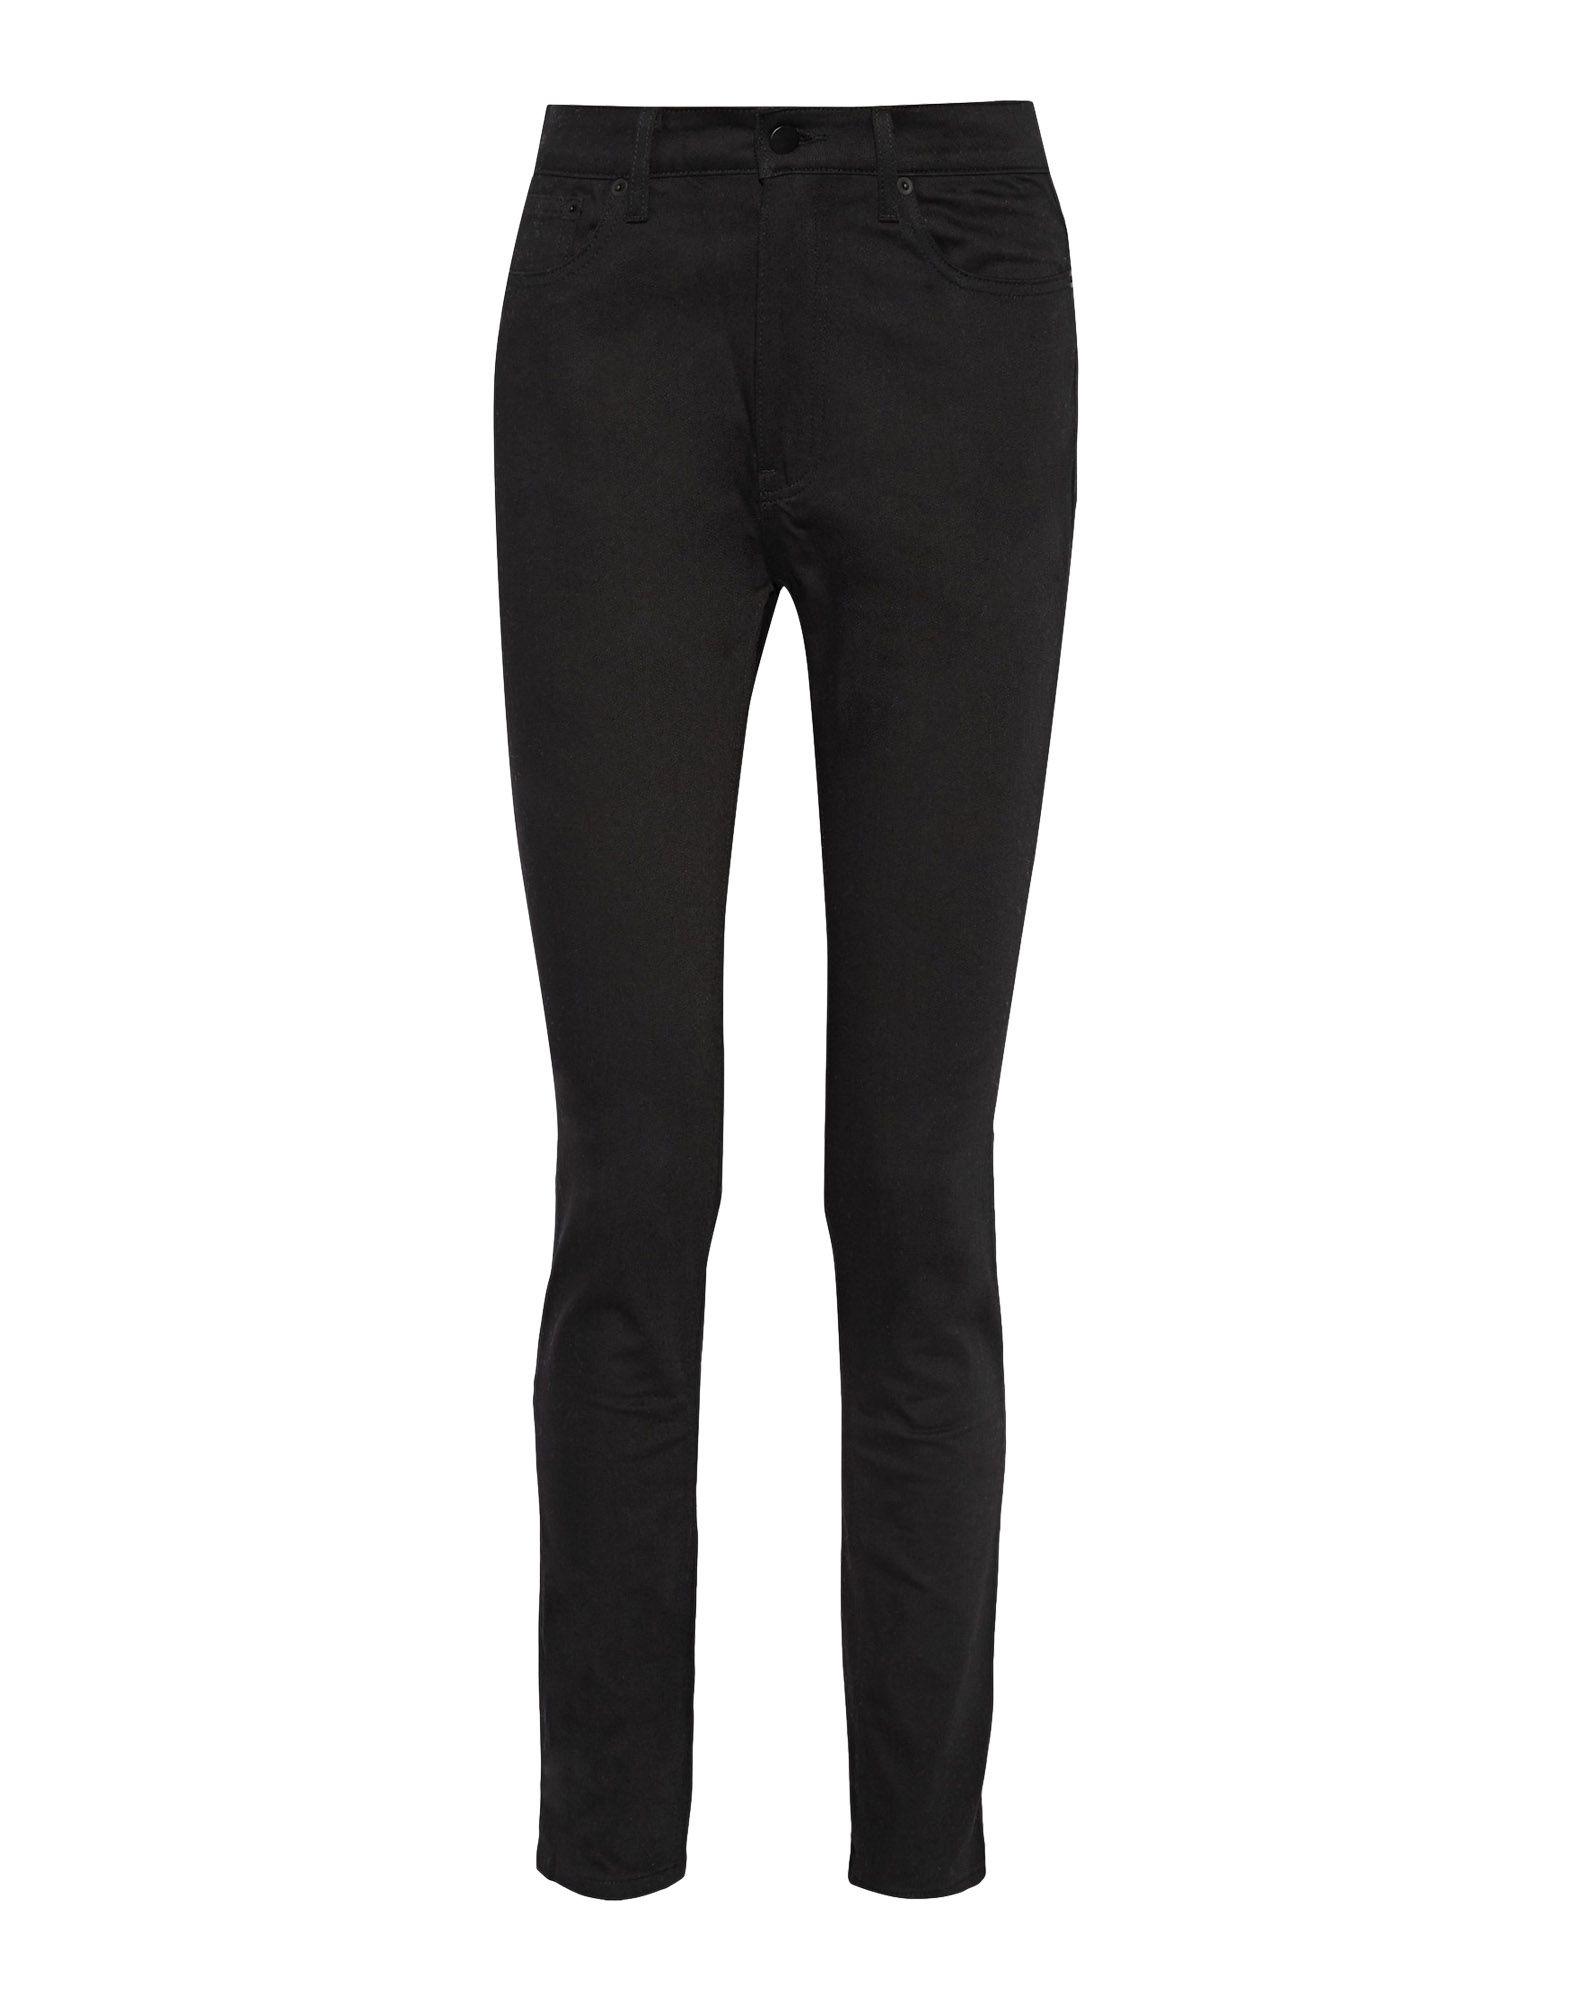 OAK Denim Pants in Black